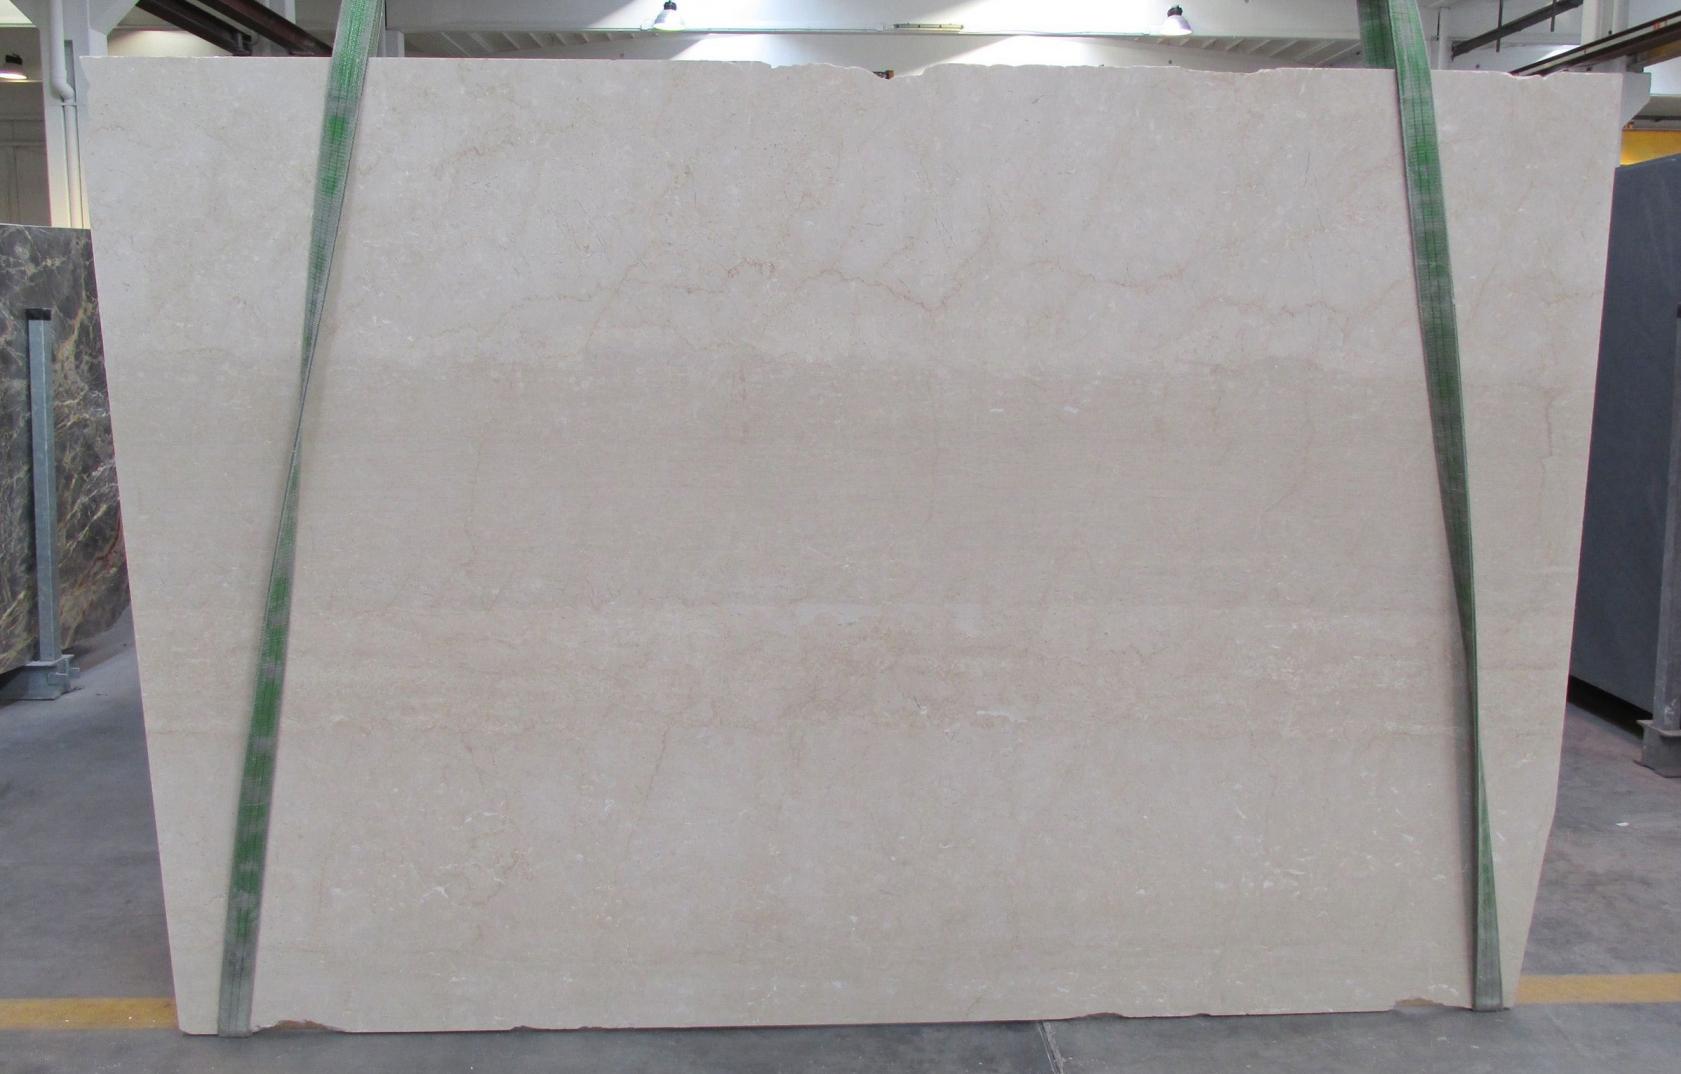 BOTTICINO SEMICLASSICO Supply Veneto (Italy) polished slabs 1278M , Bundle #1 natural marble